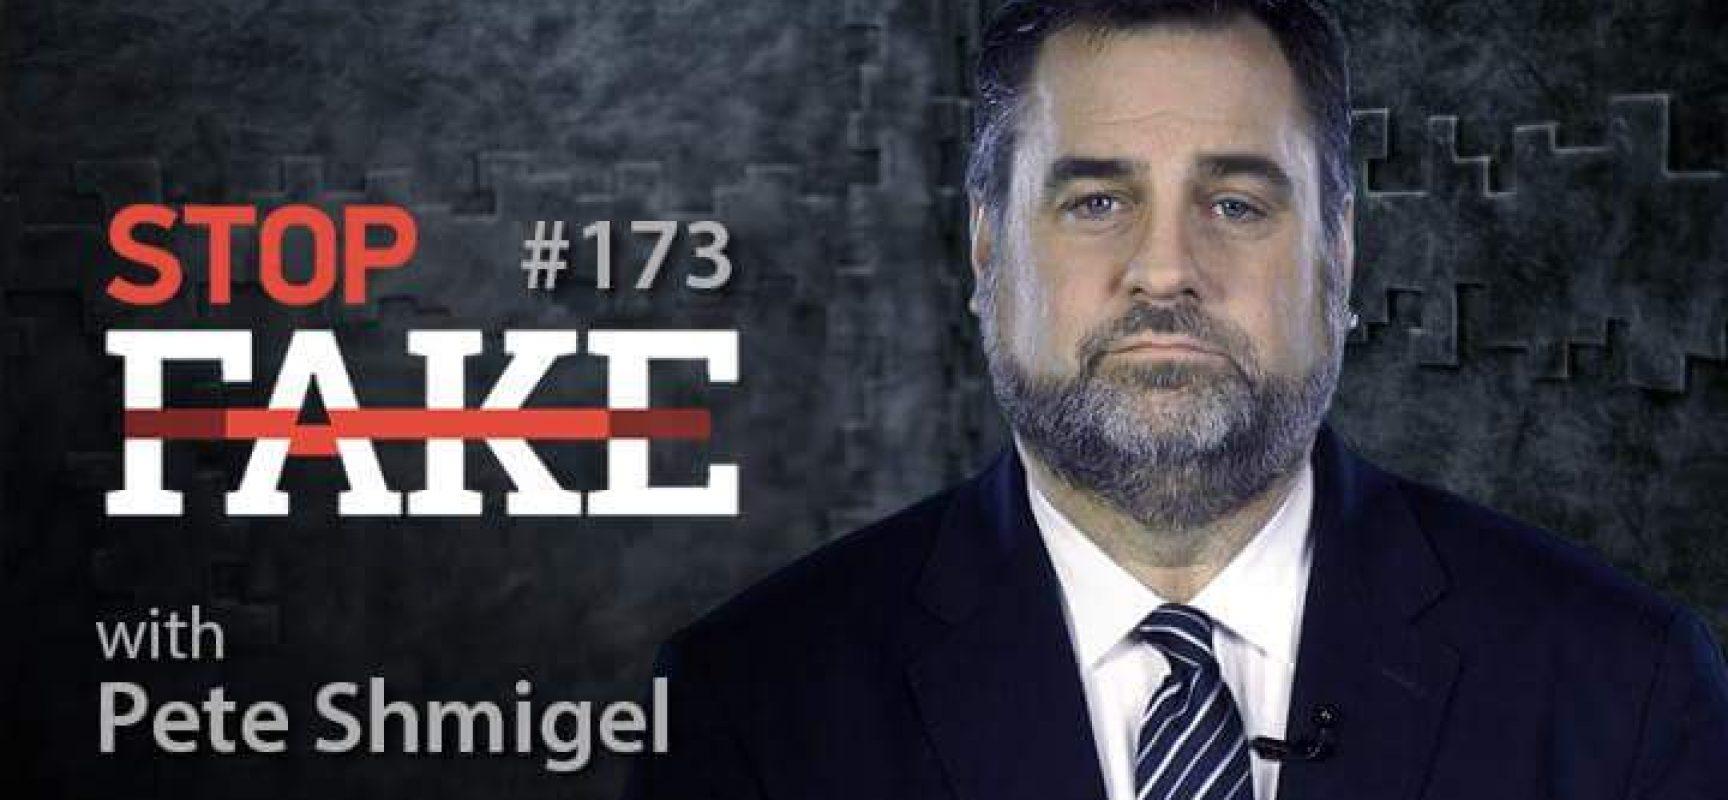 StopFakeNews #173 con Peter Shmigel